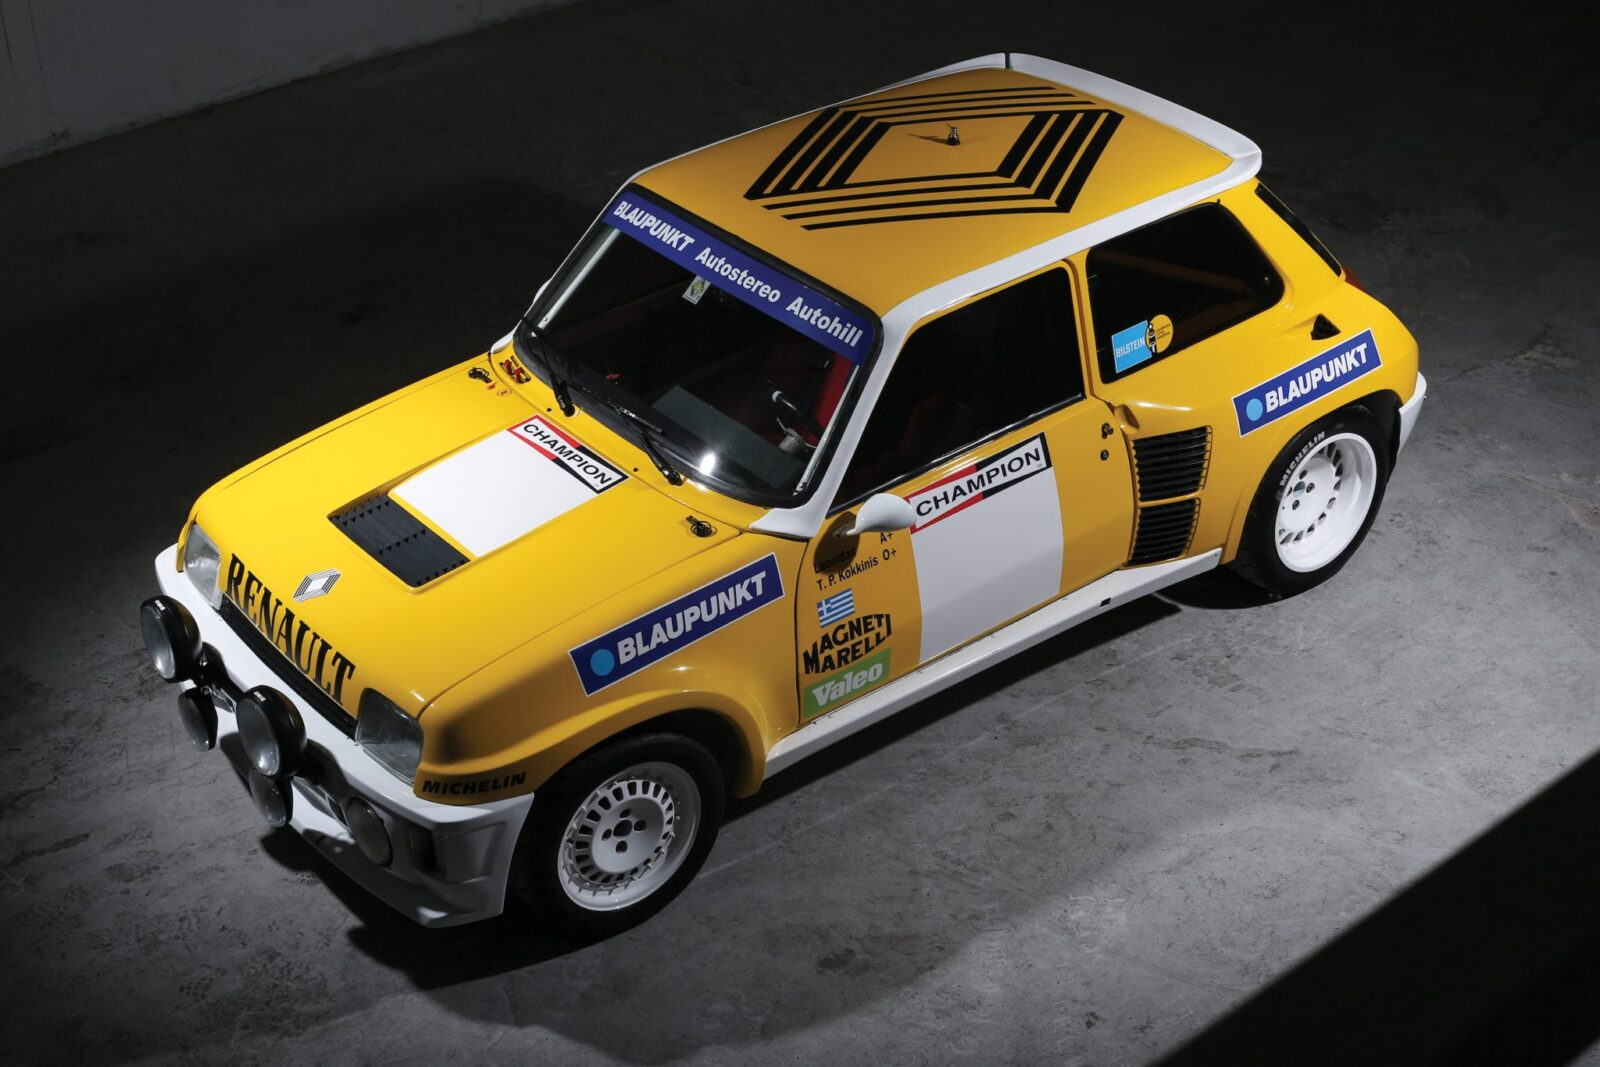 Renault 5 Turbo 10 1600x1067 - 1980 Renault 5 Turbo